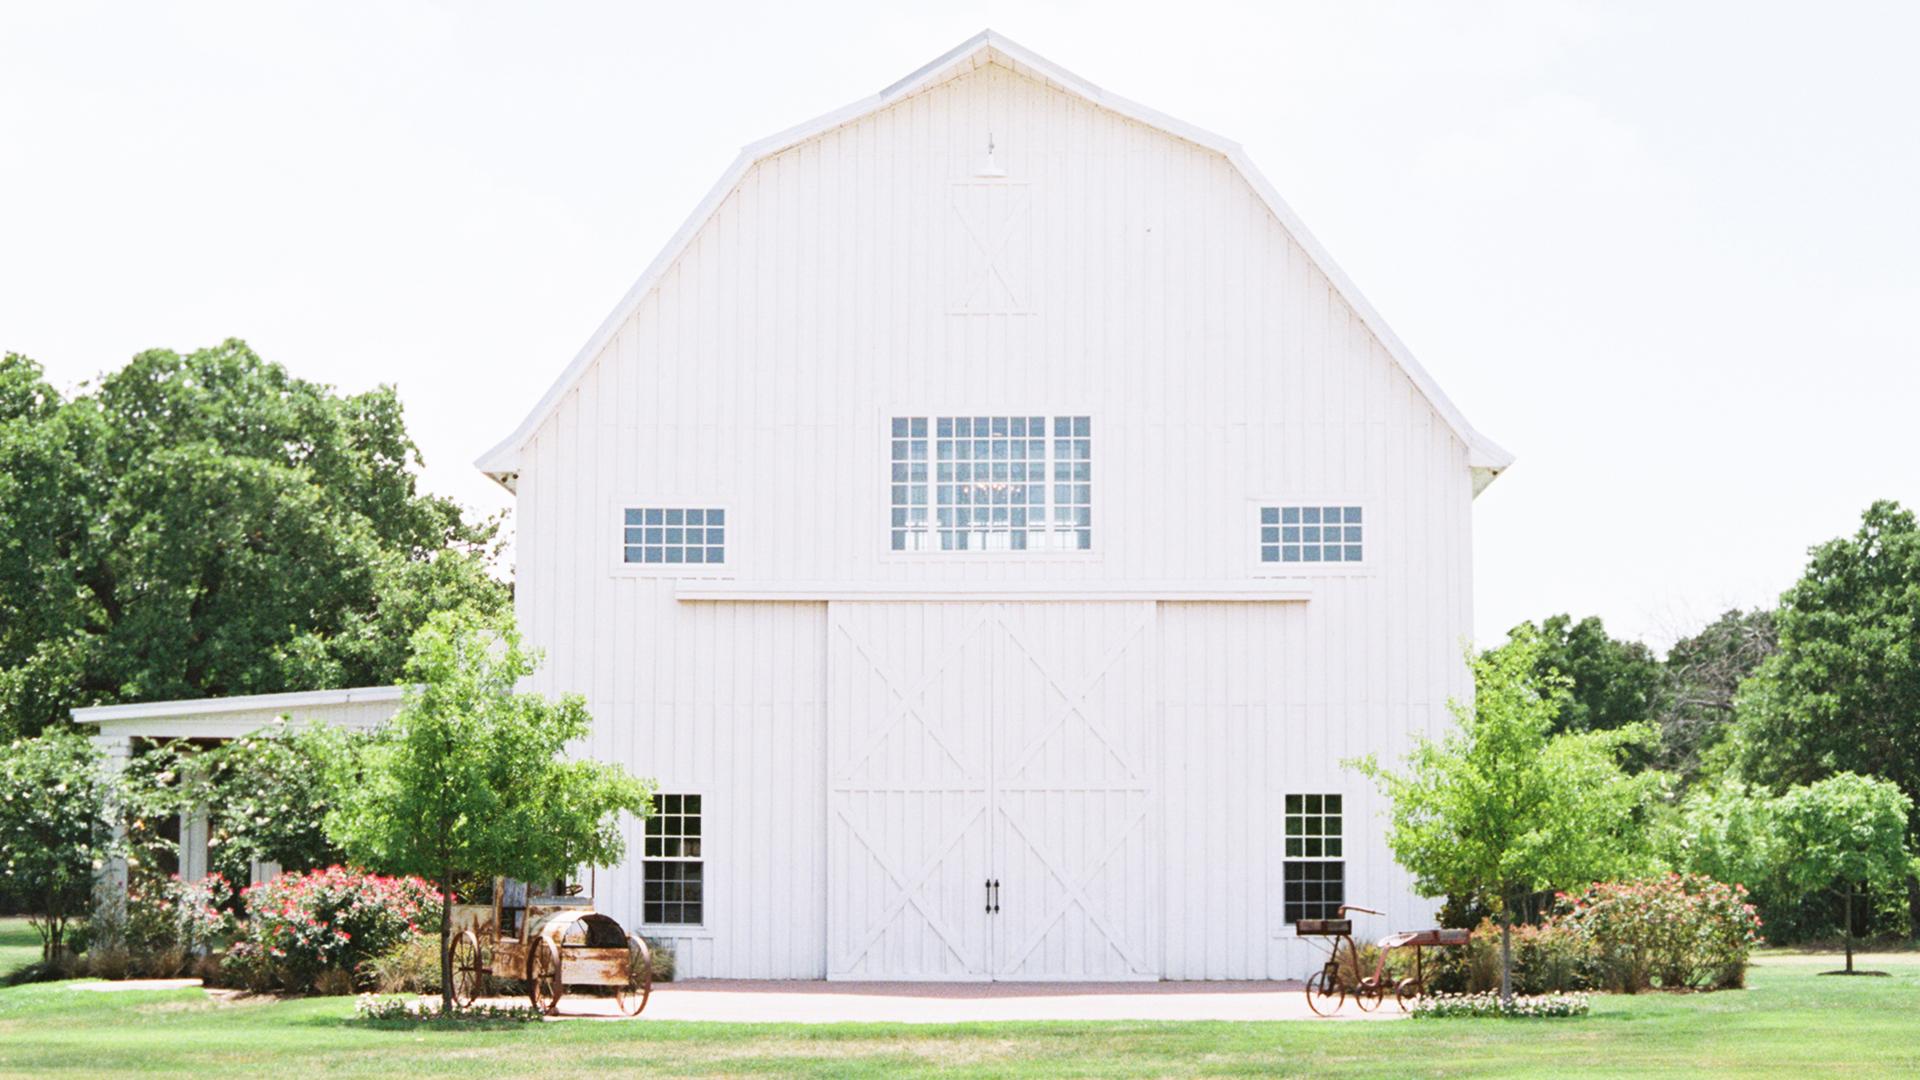 Interviu exclusiv The White Sparrow Barn Hambar Exclusive Interview hambar de nunta hambar de nunti lemn alb elegant de lux cel mai frumos hambar de nunti din lume